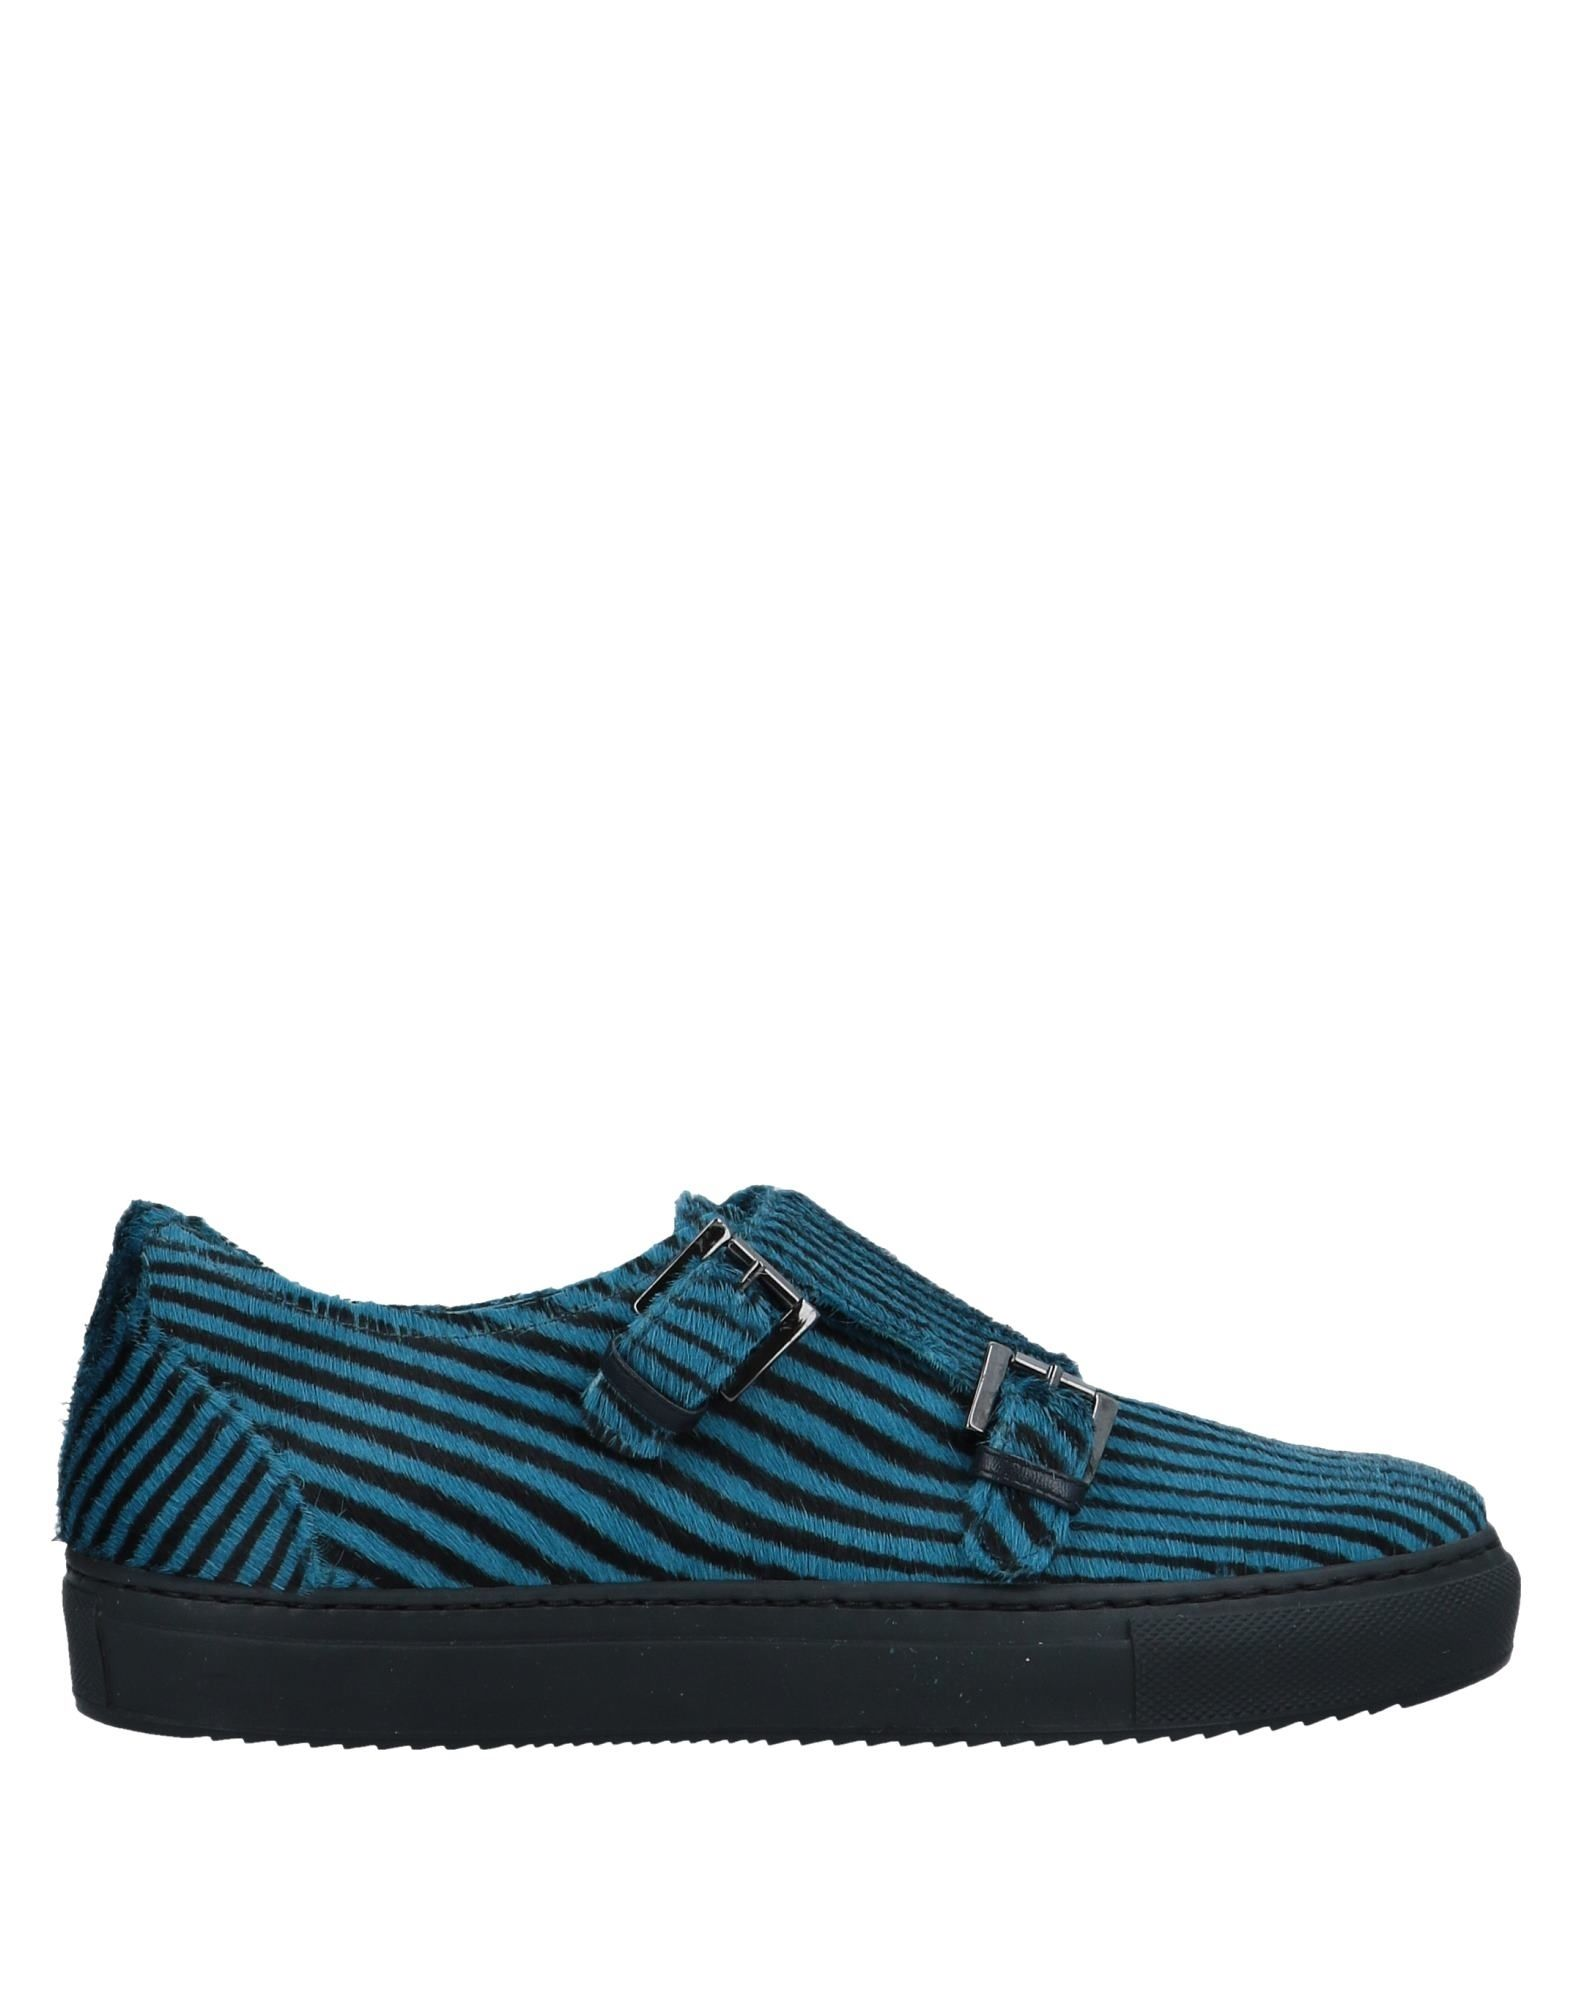 Dibrera By Paolo aussehende Zanoli Mokassins Damen  11557965VBGut aussehende Paolo strapazierfähige Schuhe 1a90cd